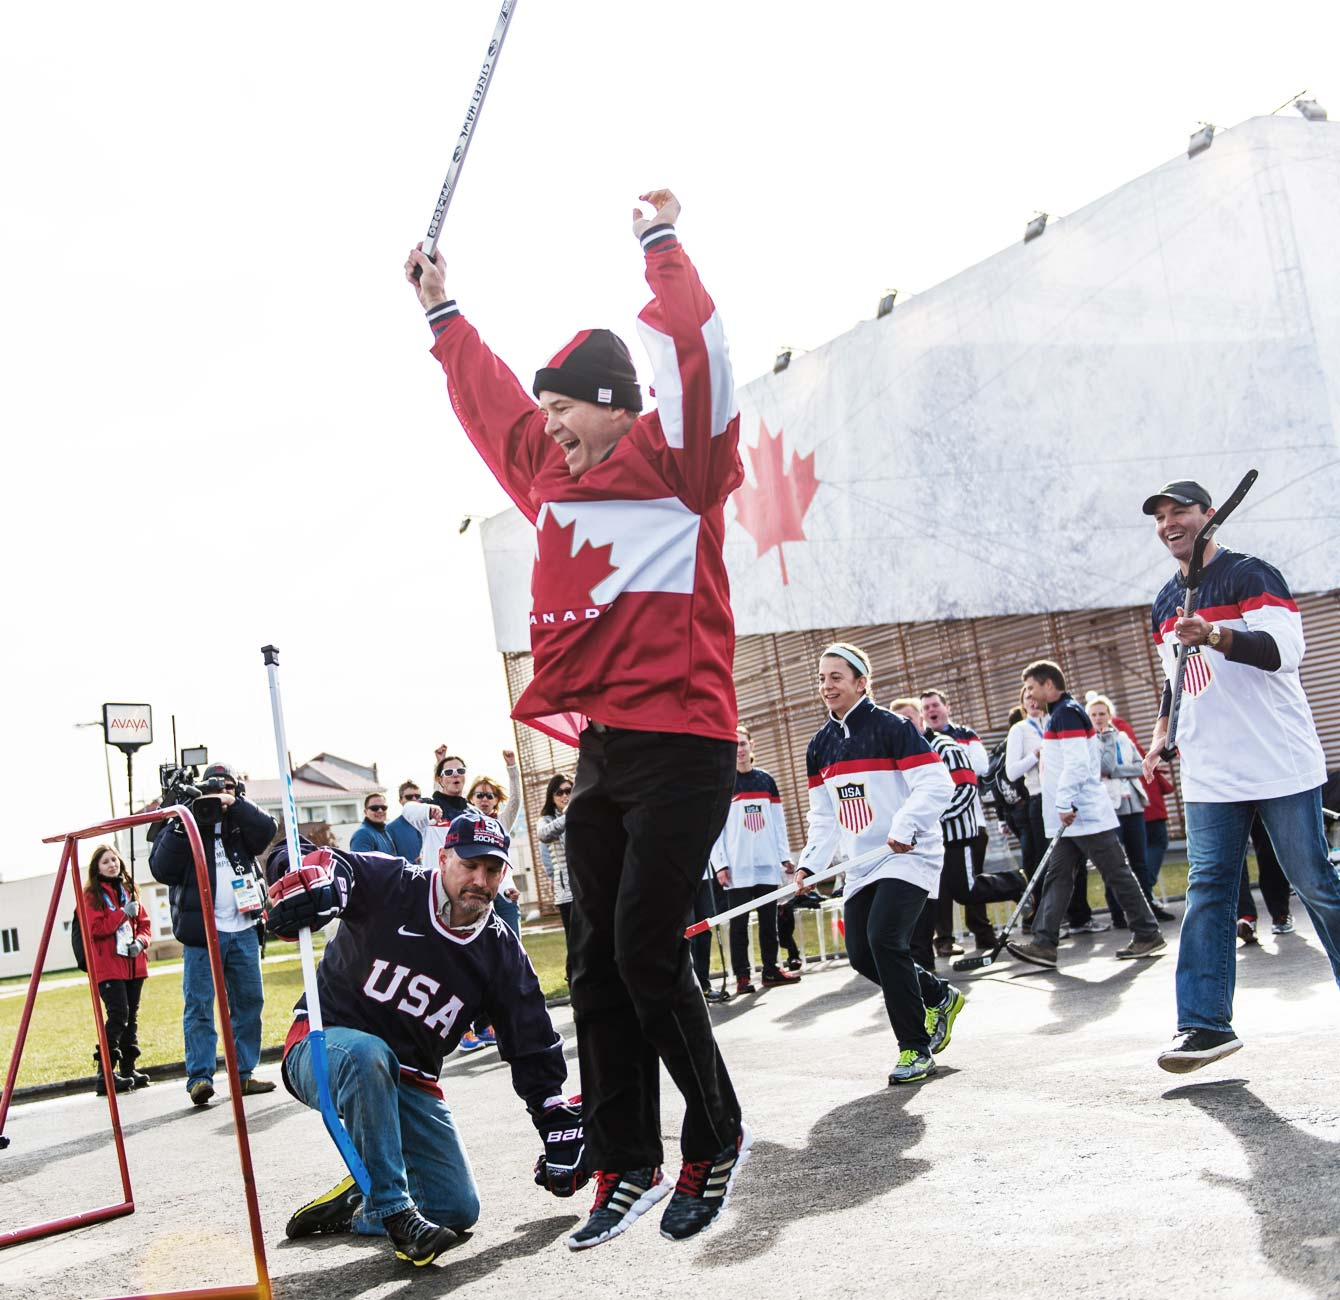 ballhockey-overholt-win